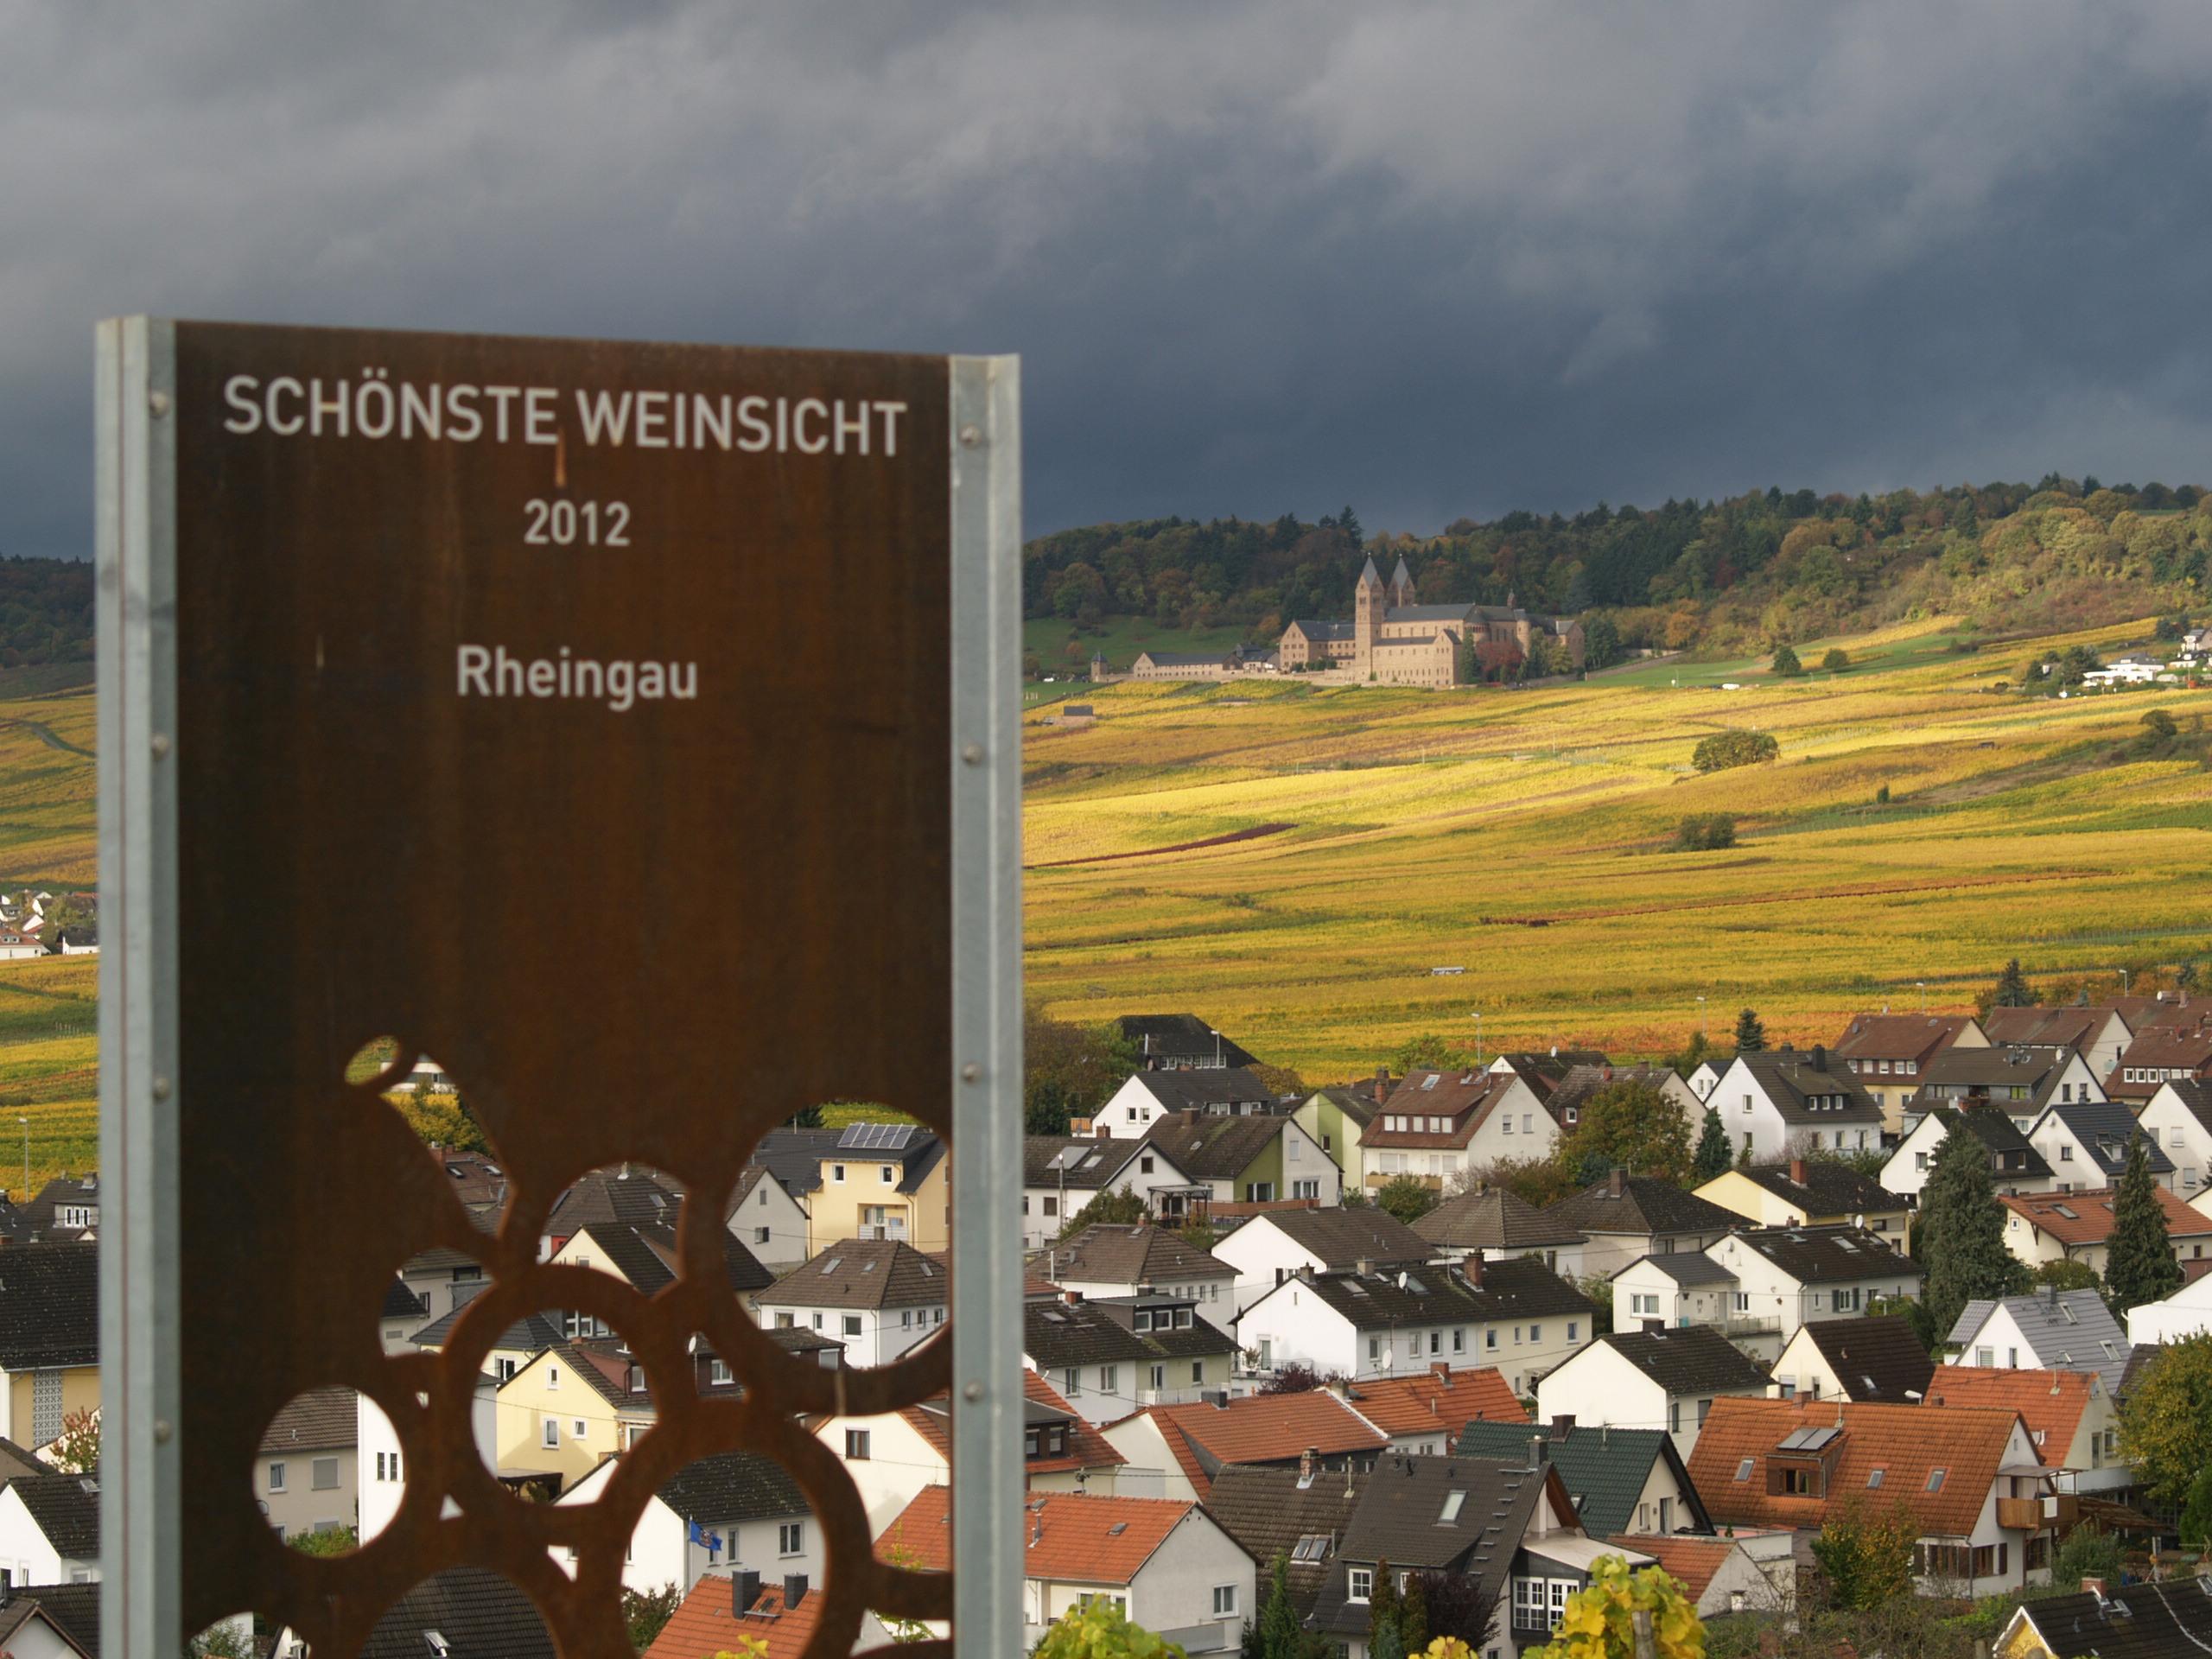 Mords-Wanderung Geisenheim